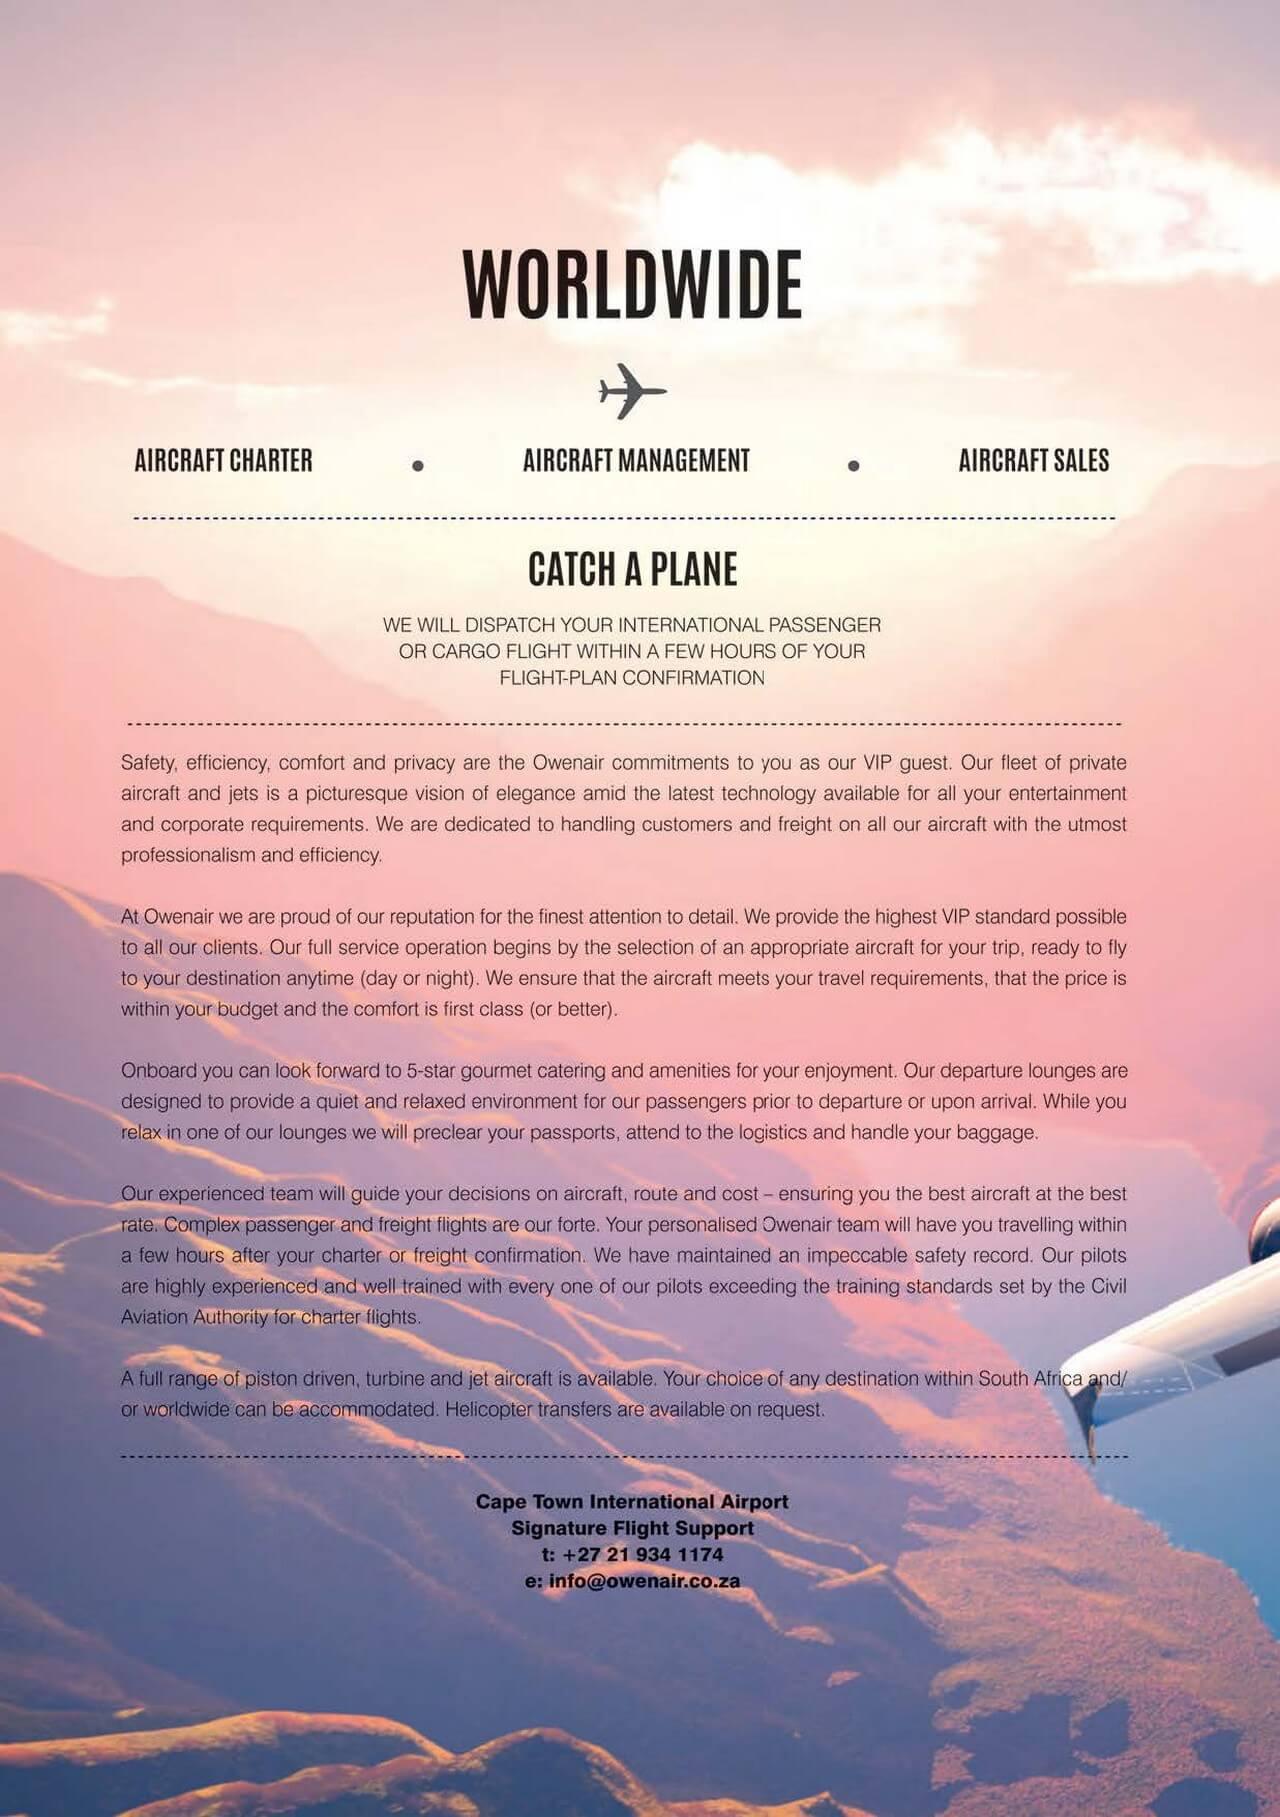 close [X] Travel i & Visas Travel Market Airlines Air charter